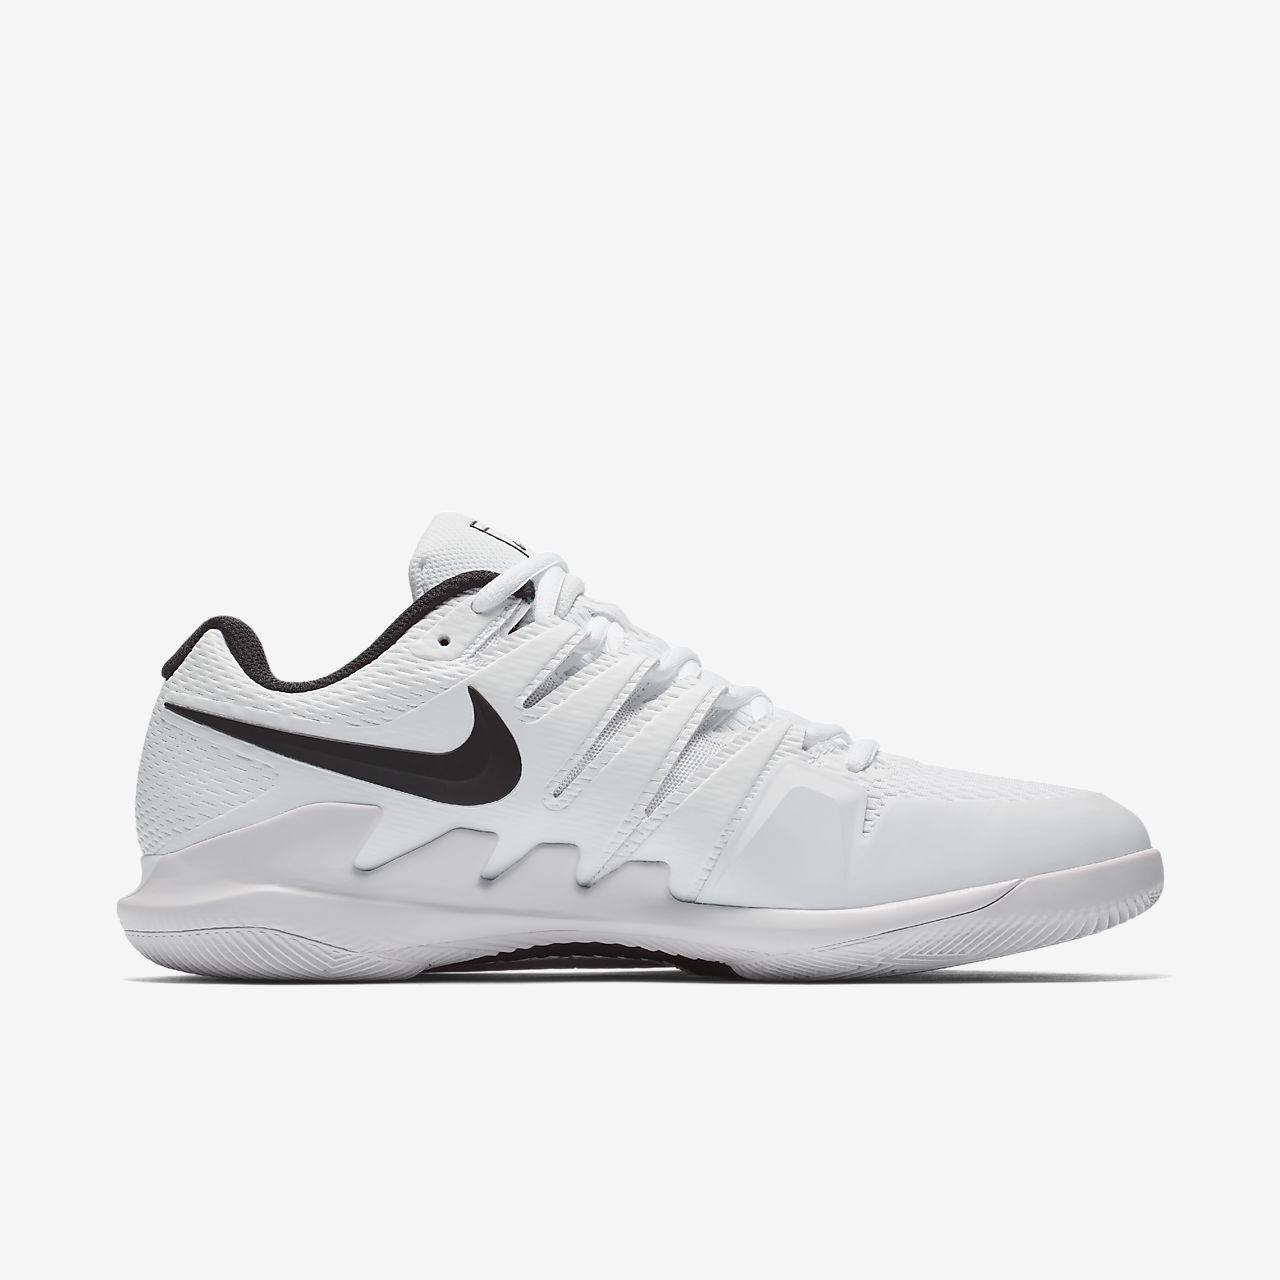 Da Uomo Ragazzi Nike SB Zoom Scarpe Da Ginnastica All Court